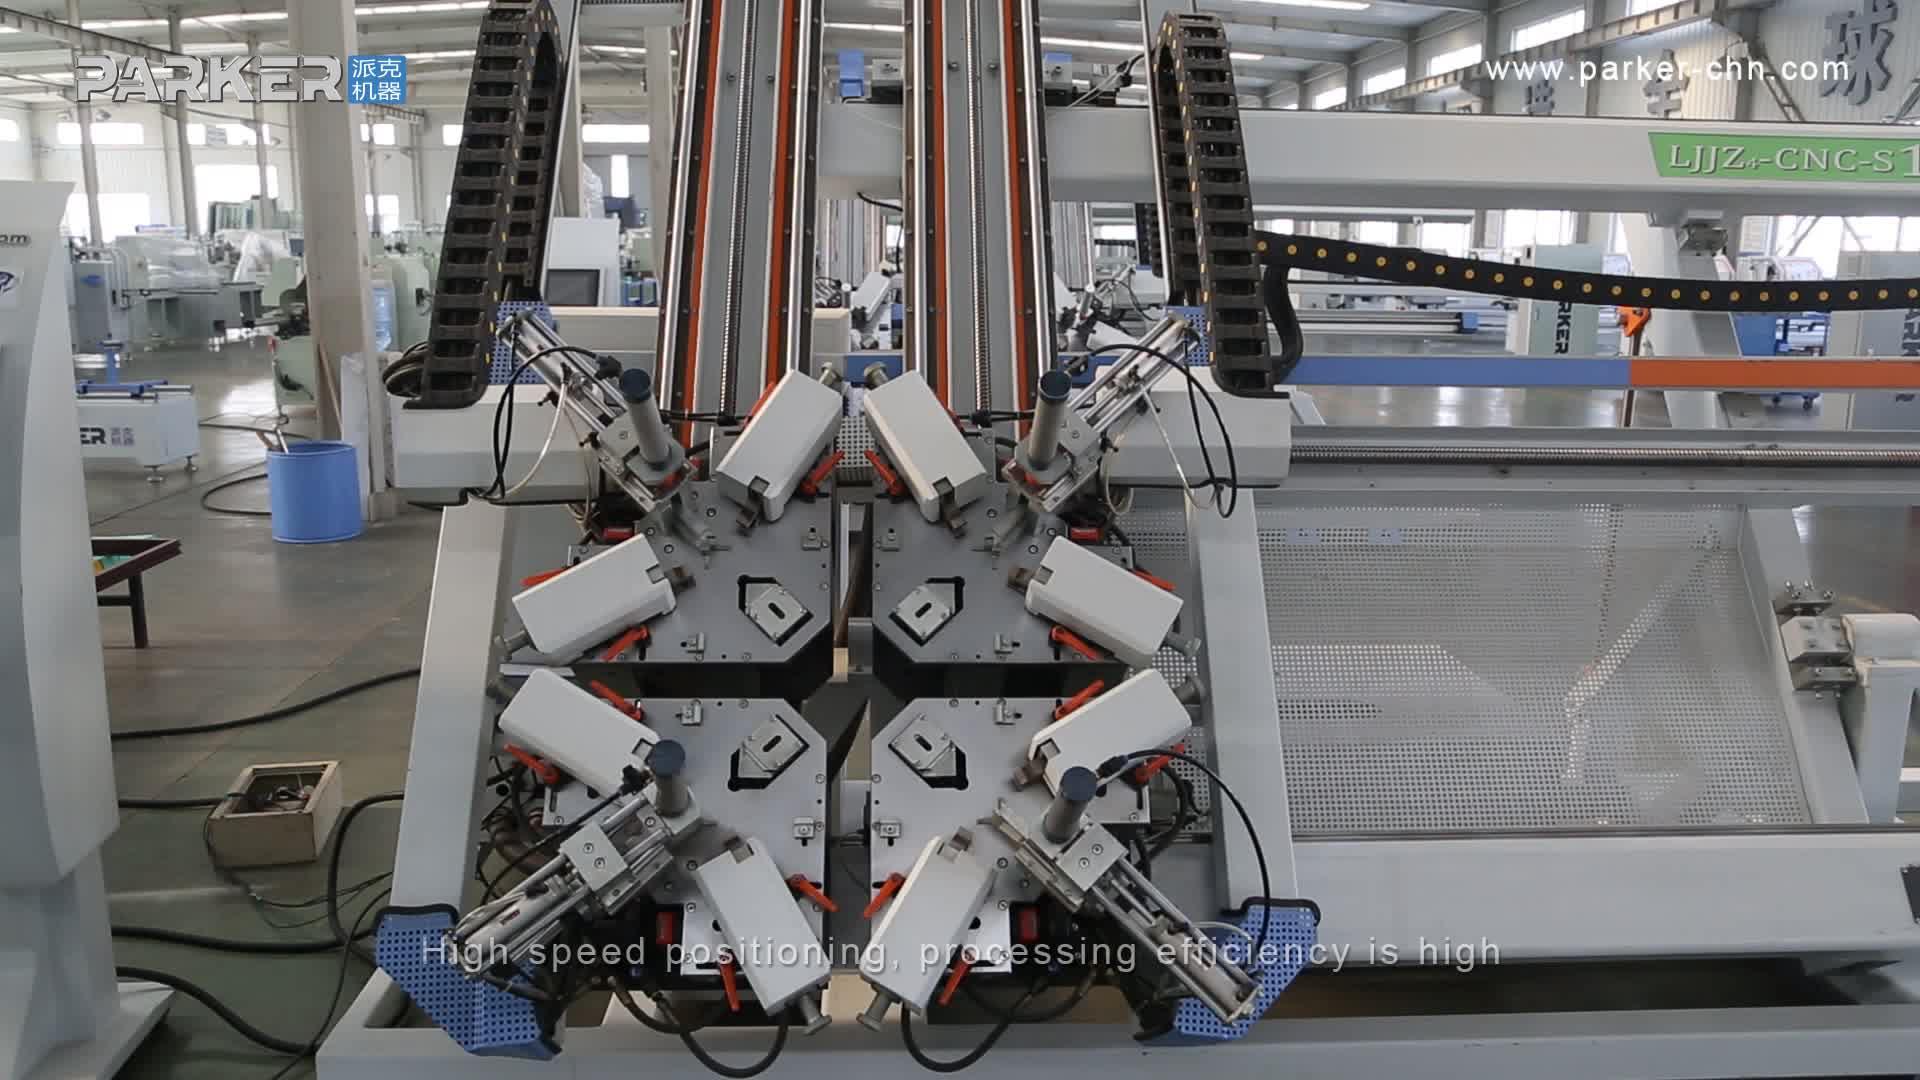 CE Belgeli Alüminyum Kapı Pencere CNC 4 Köşe Sıkma Makinesi